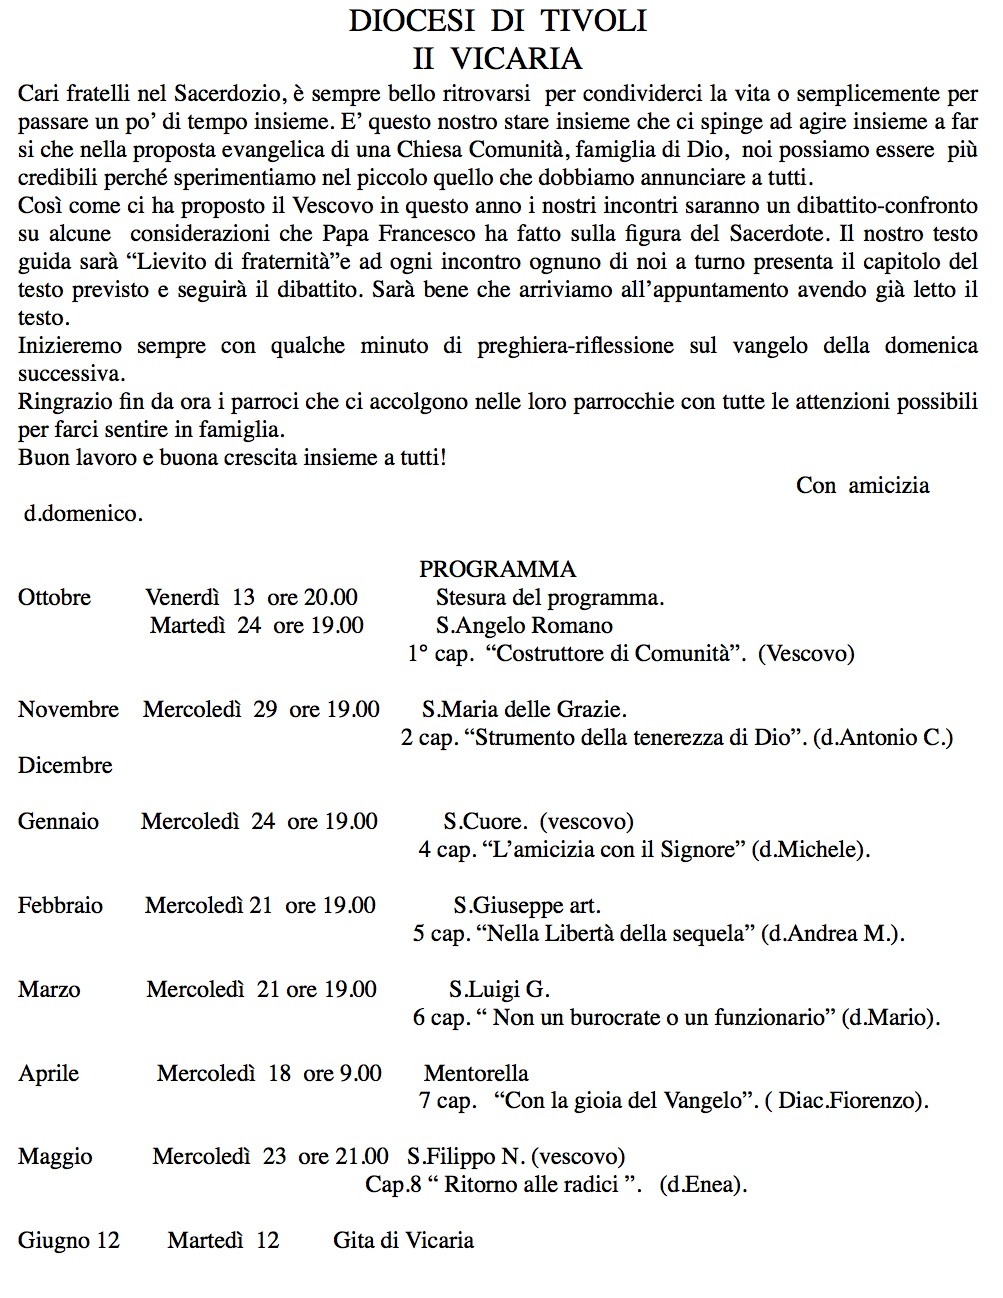 ii vicaria programma 2107.18.docx.jpg